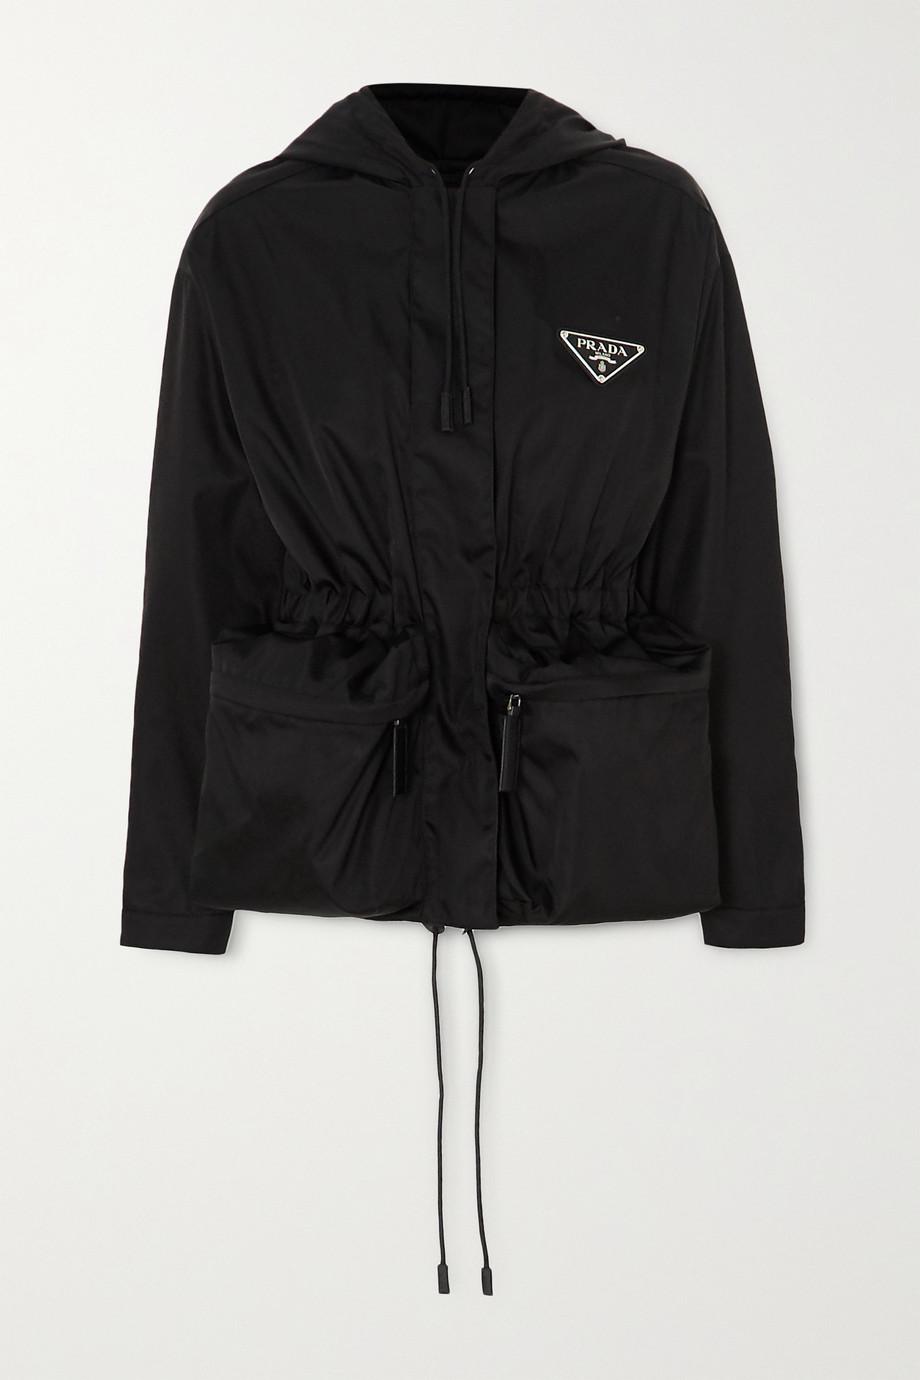 Prada Hooded appliquéd nylon jacket